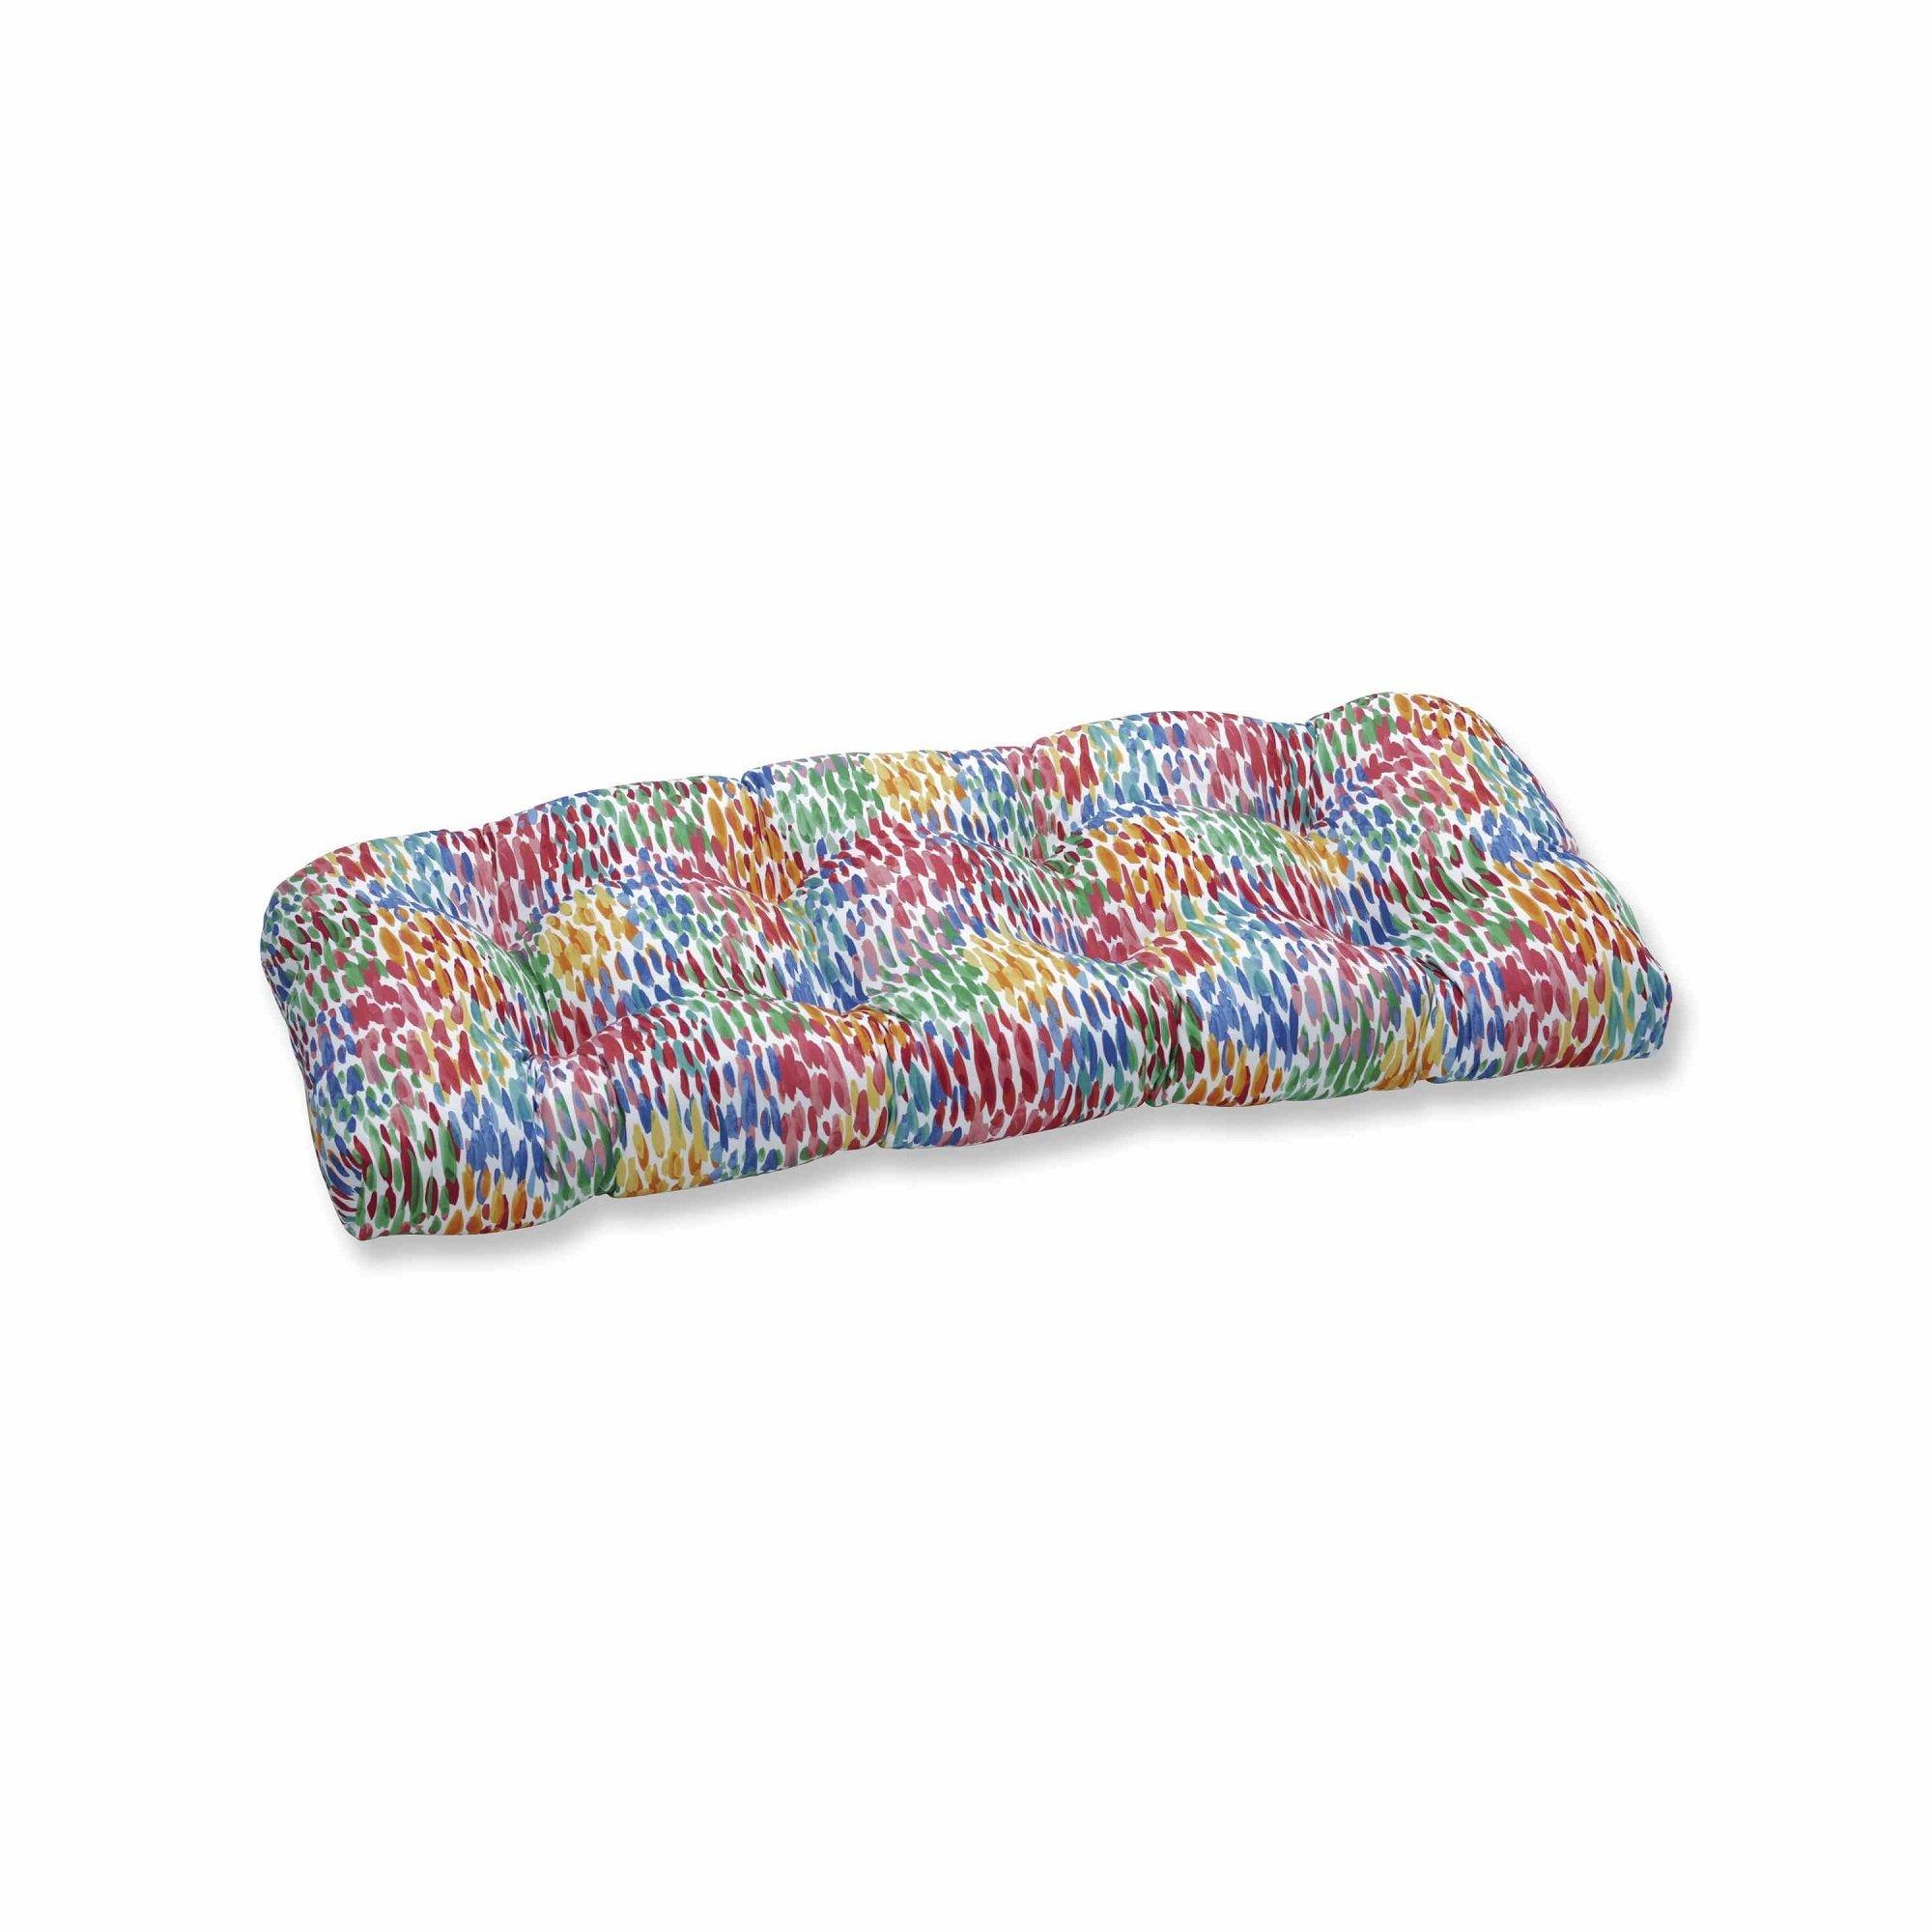 OKSLO Make it rain zinnia wicker loveseat cushion